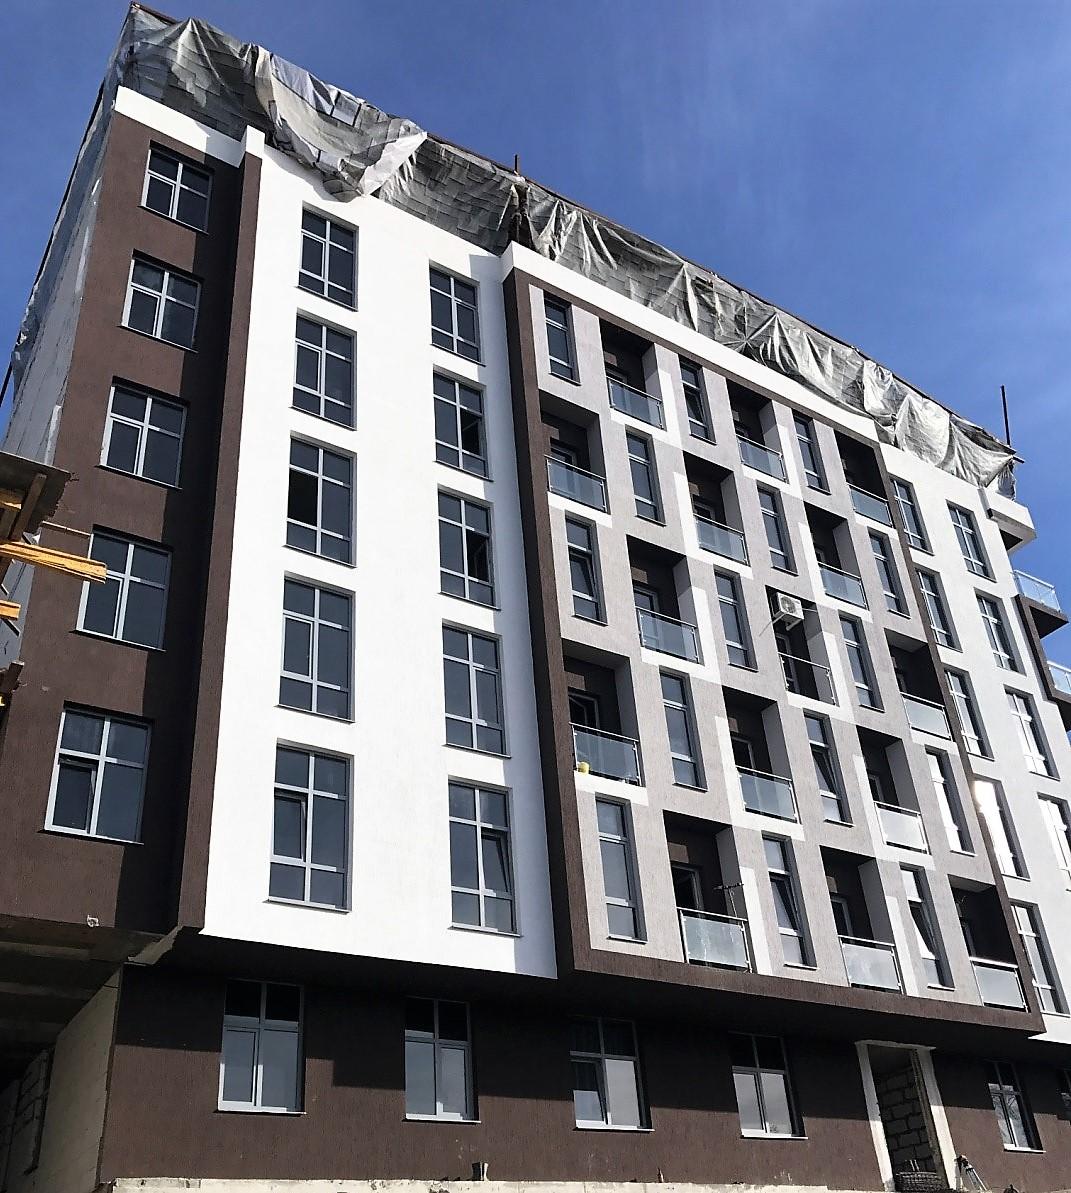 Жилой комплекс на ул.Тимирязева в г.Сочи.